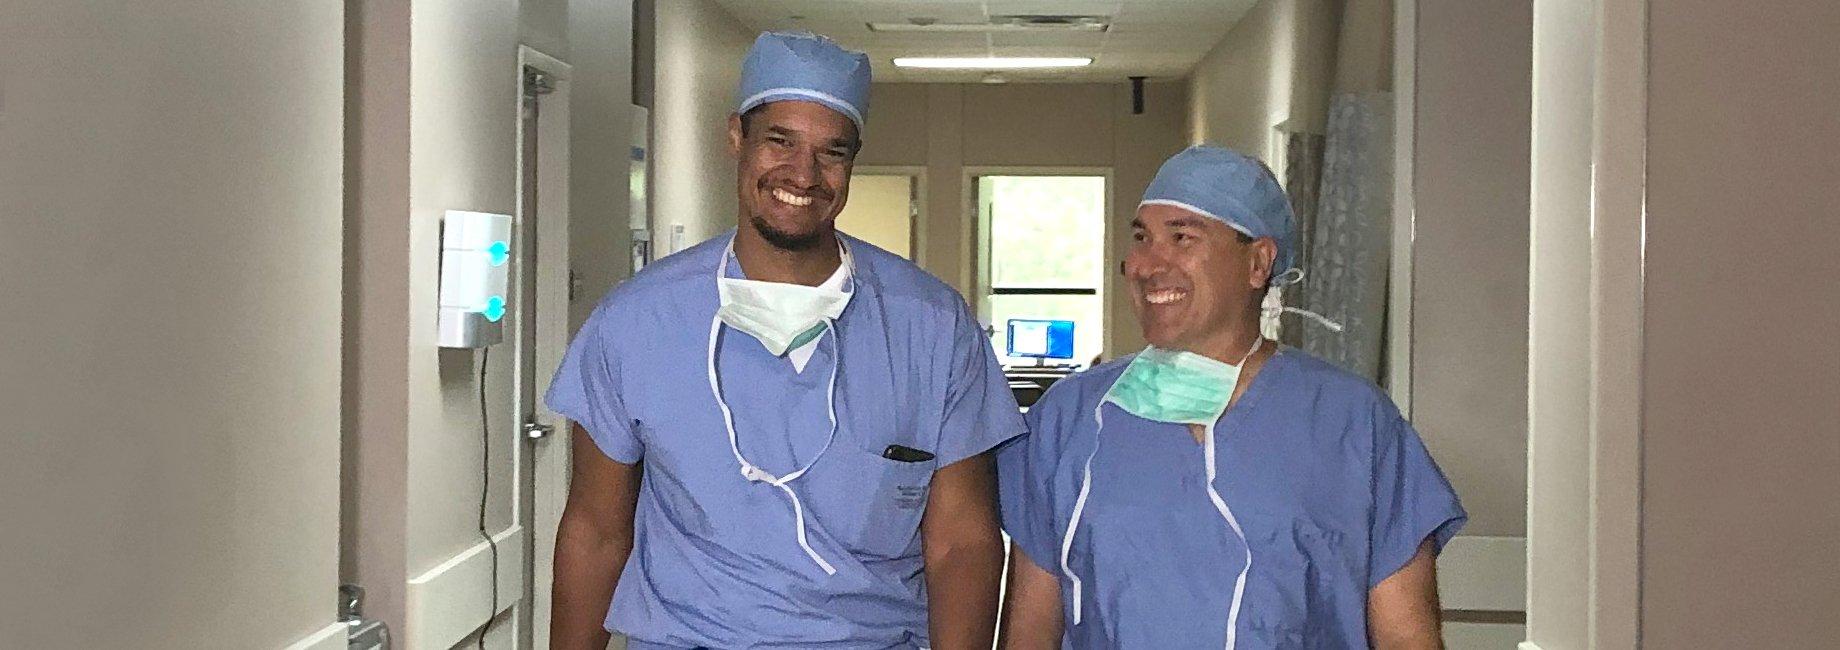 NRMC General Surgery Associates